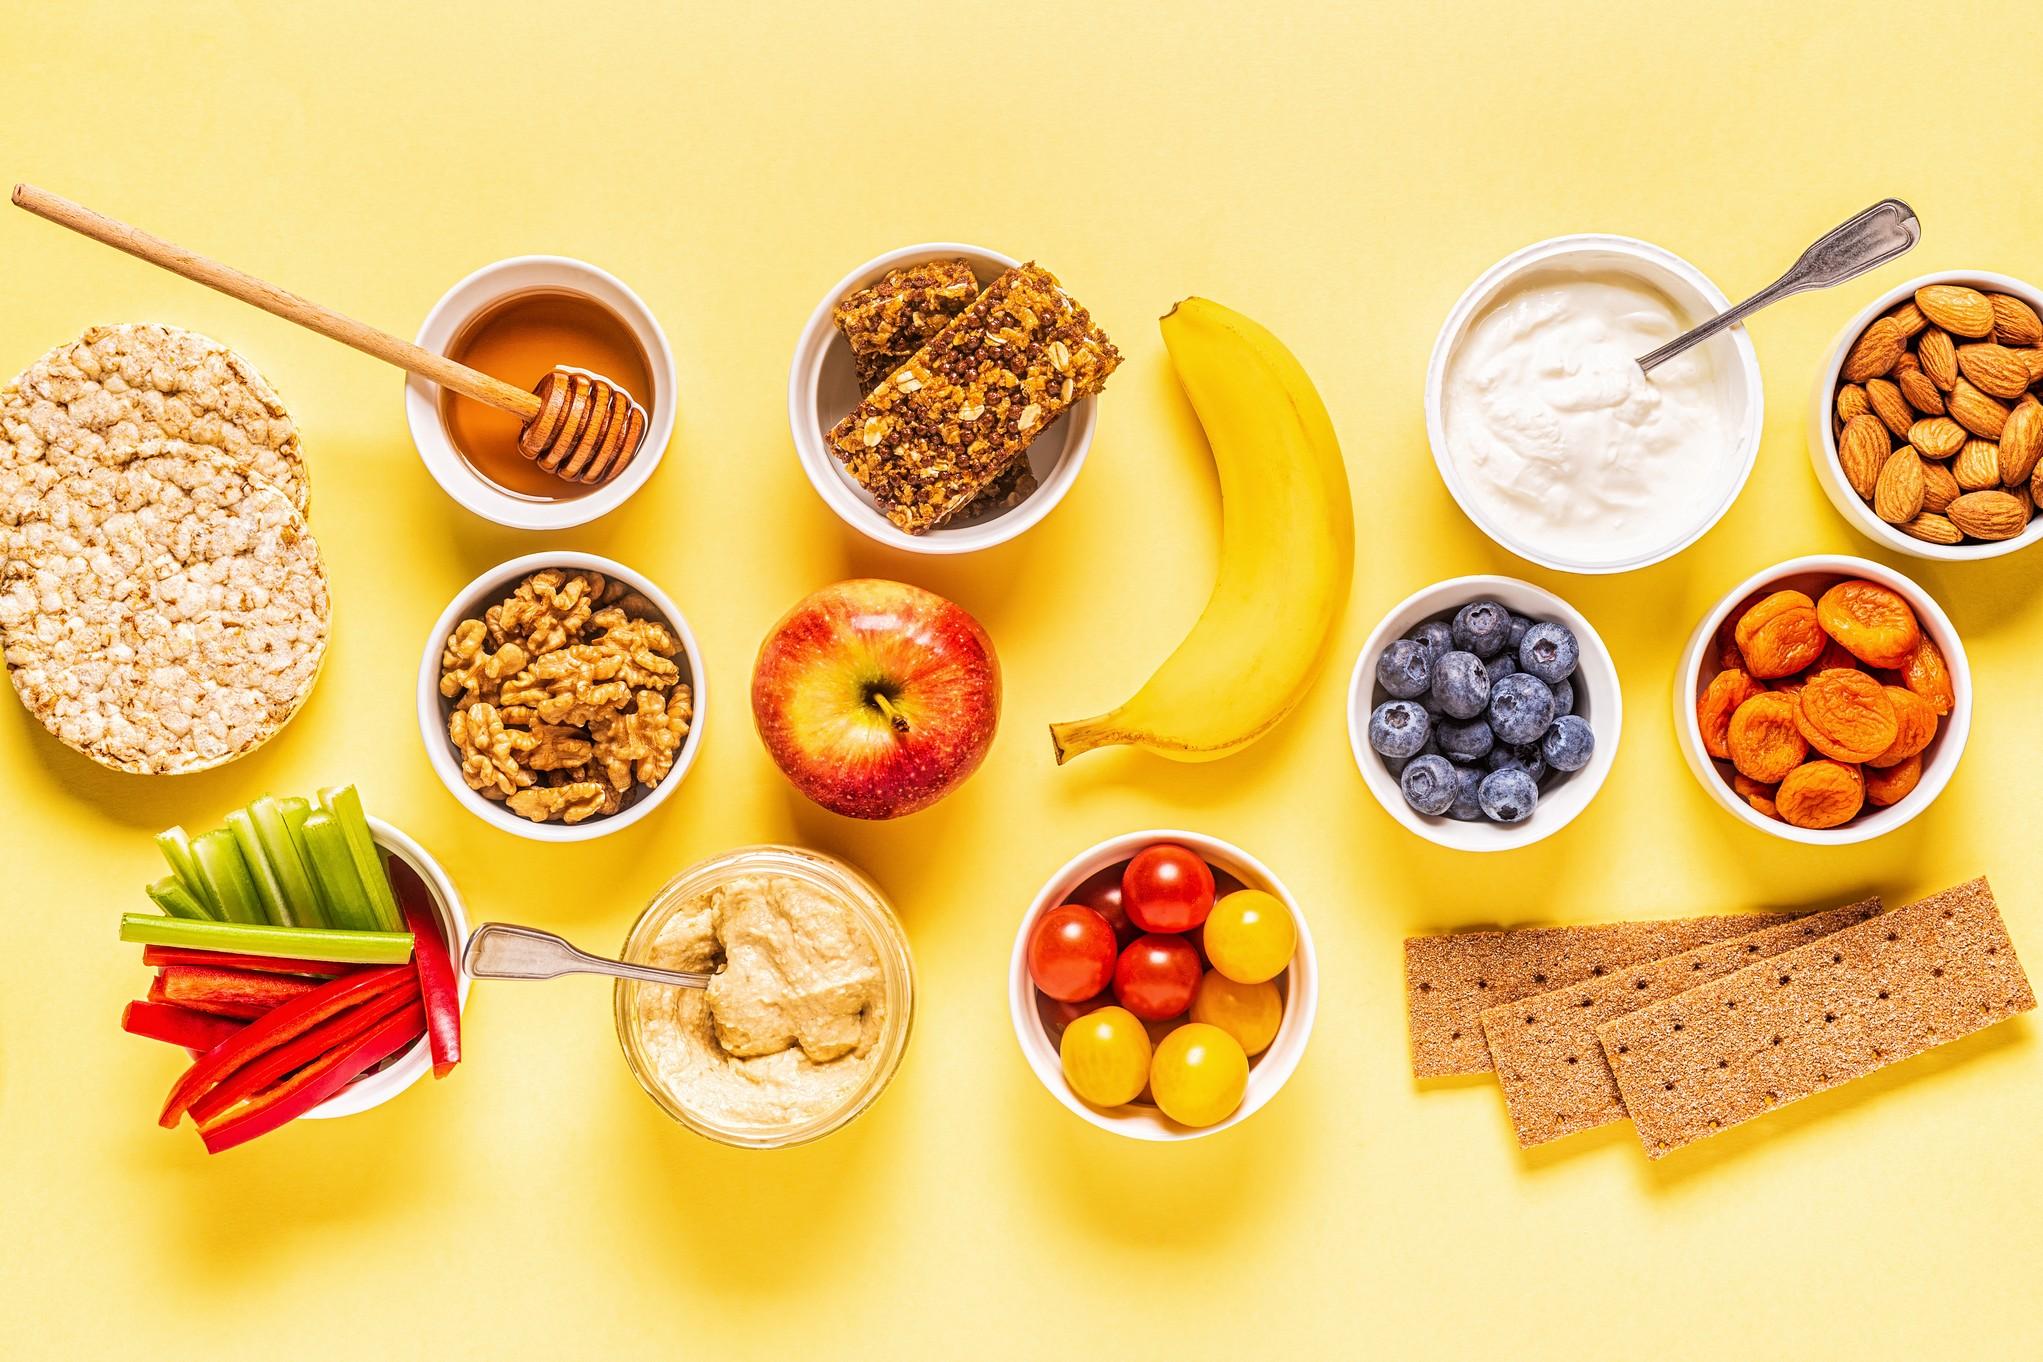 Denver Alternative Snack Choices | Better-for-You | Healthy Break Room